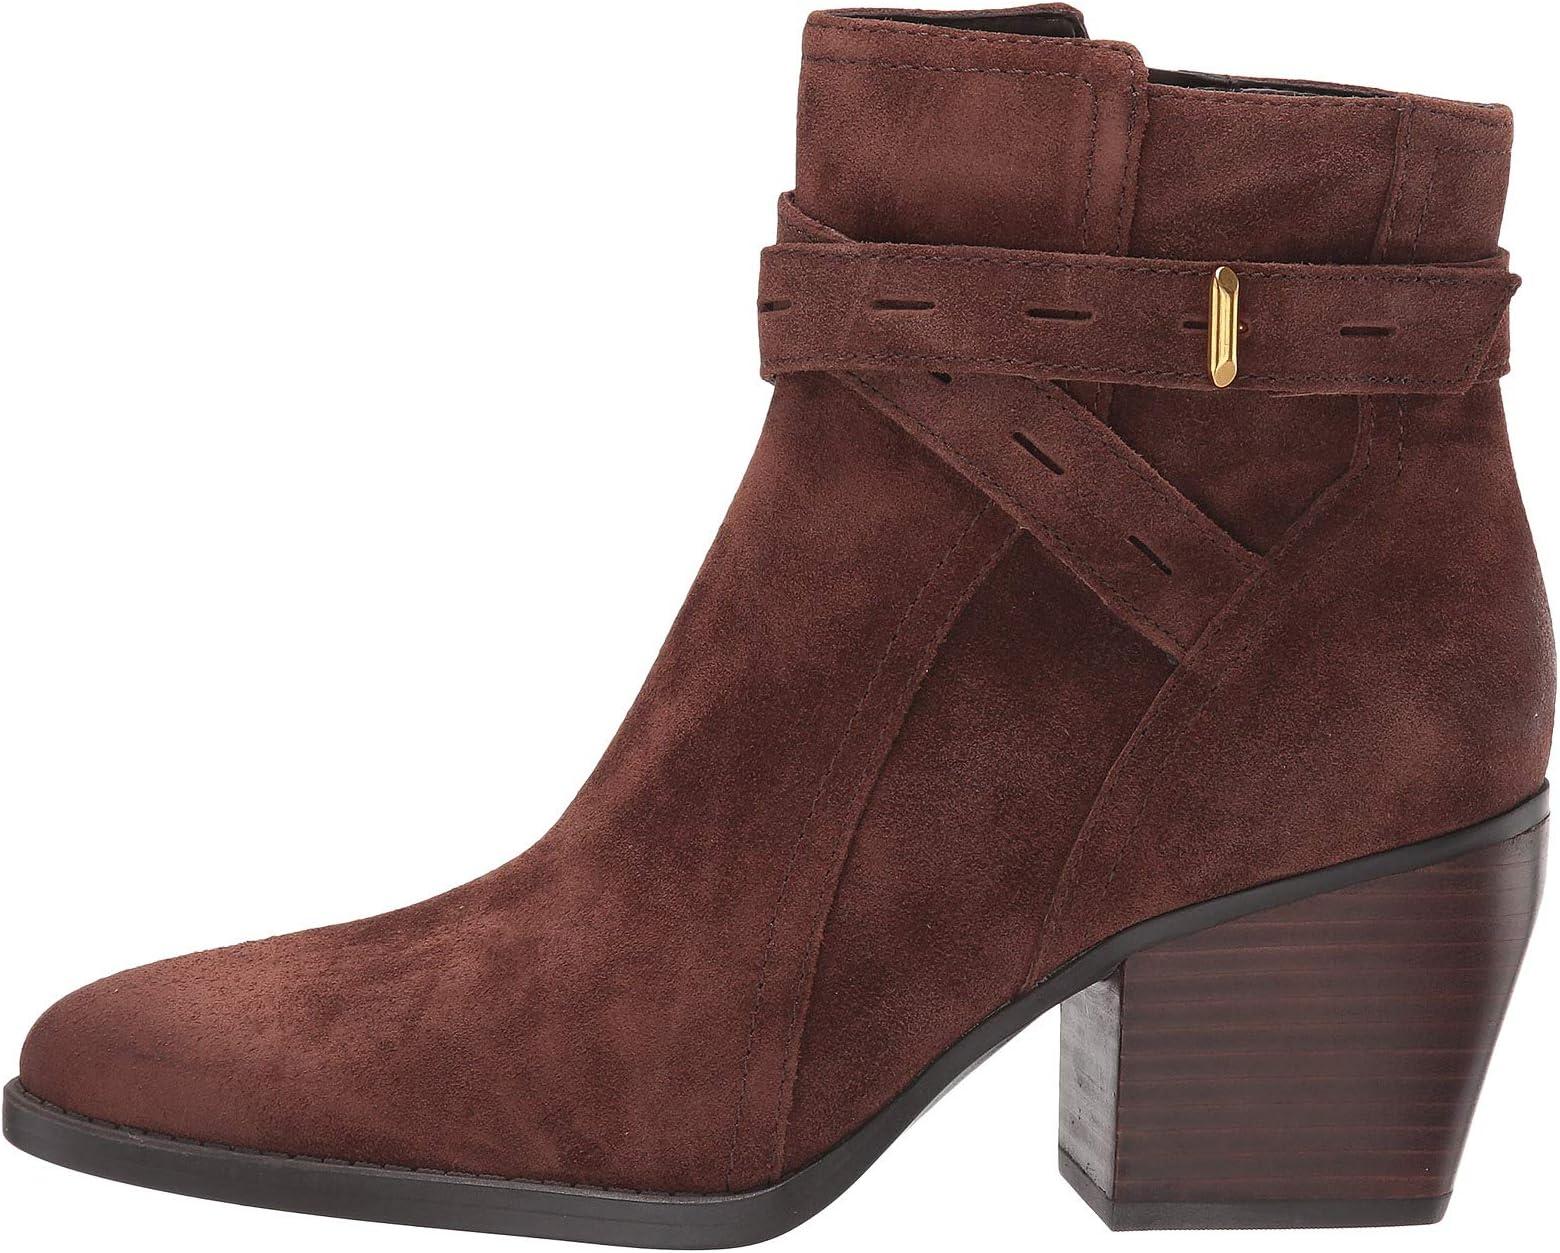 Naturalizer Fenya | Women's shoes | 2020 Newest